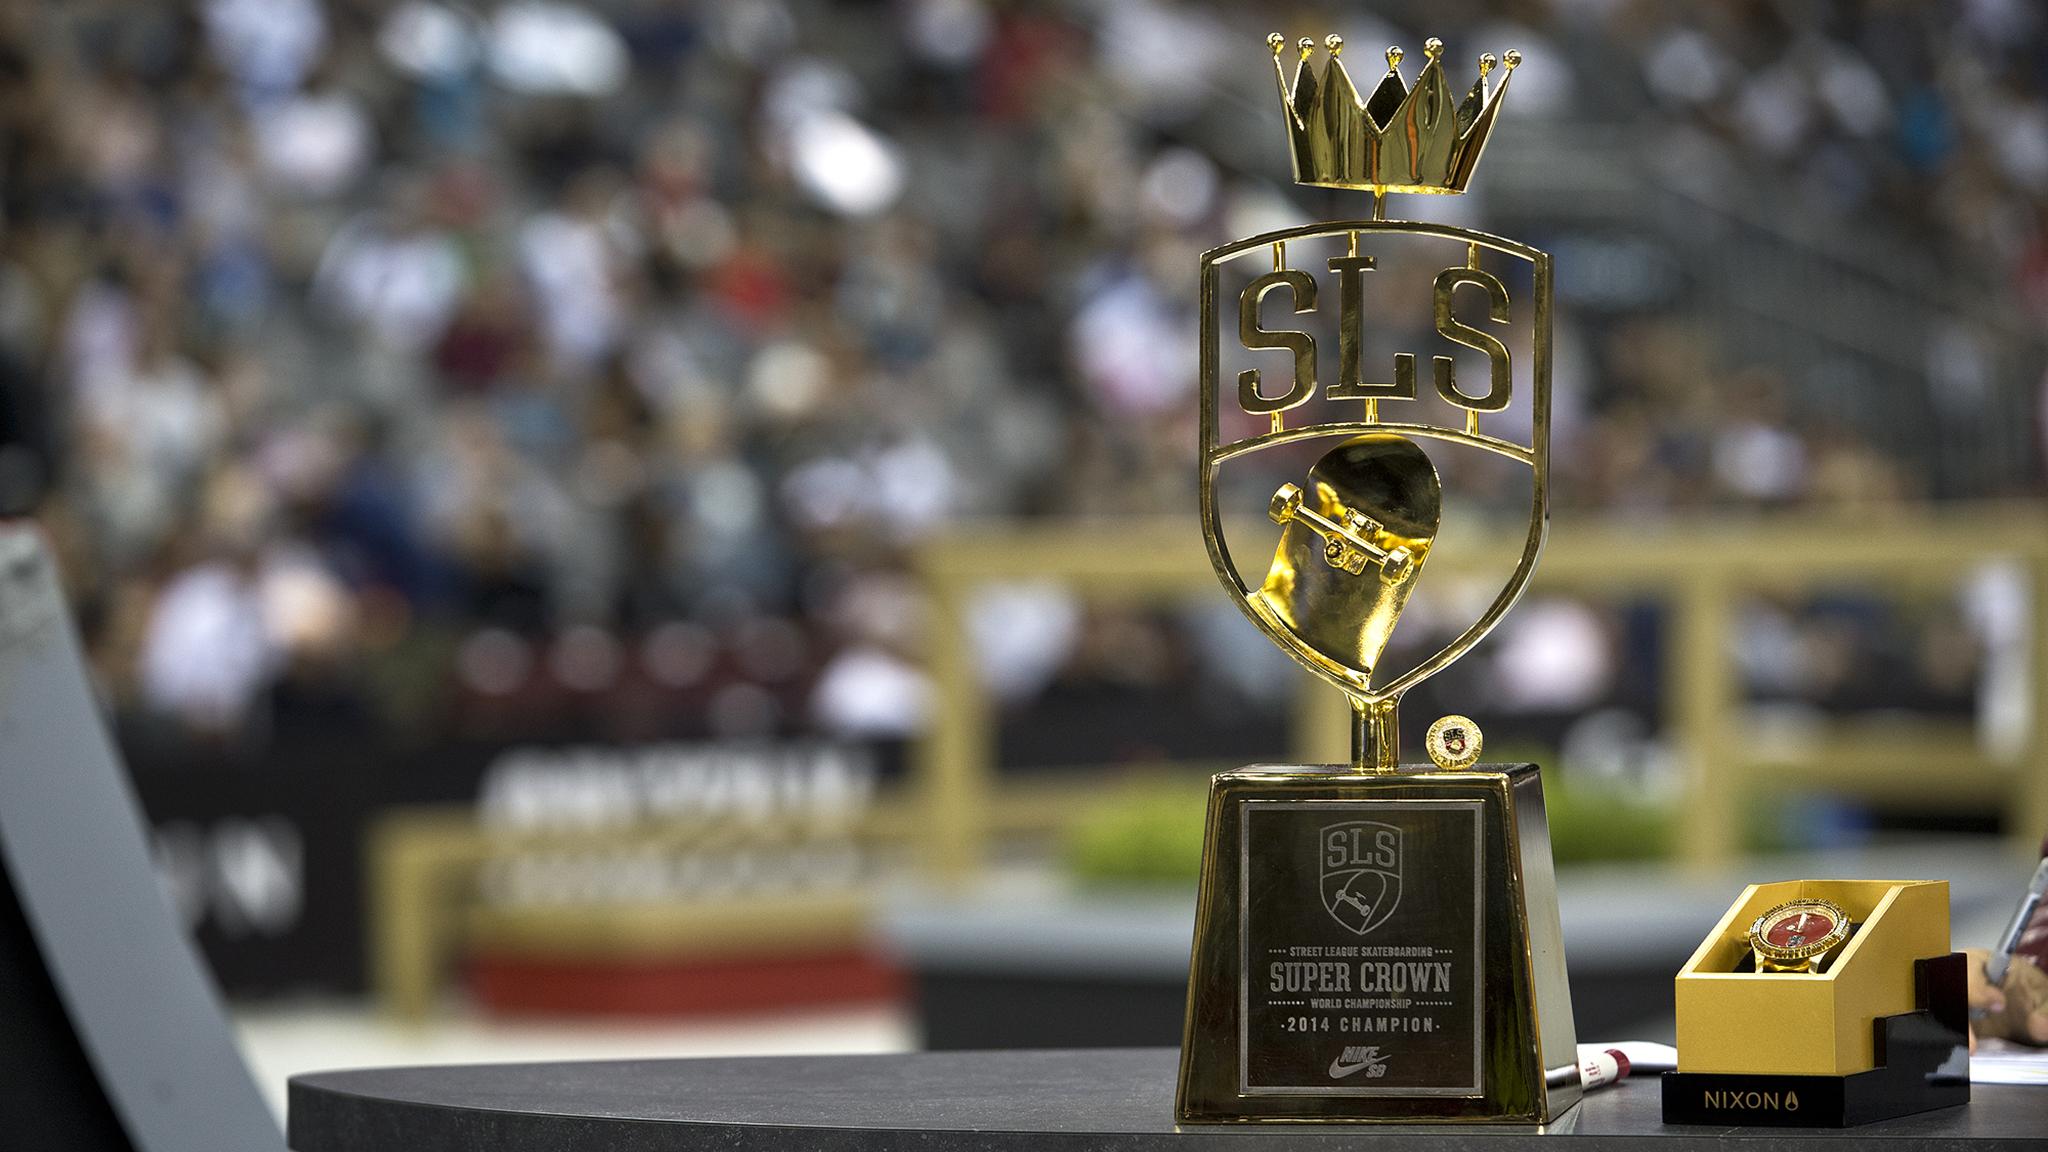 Super Crown trophy